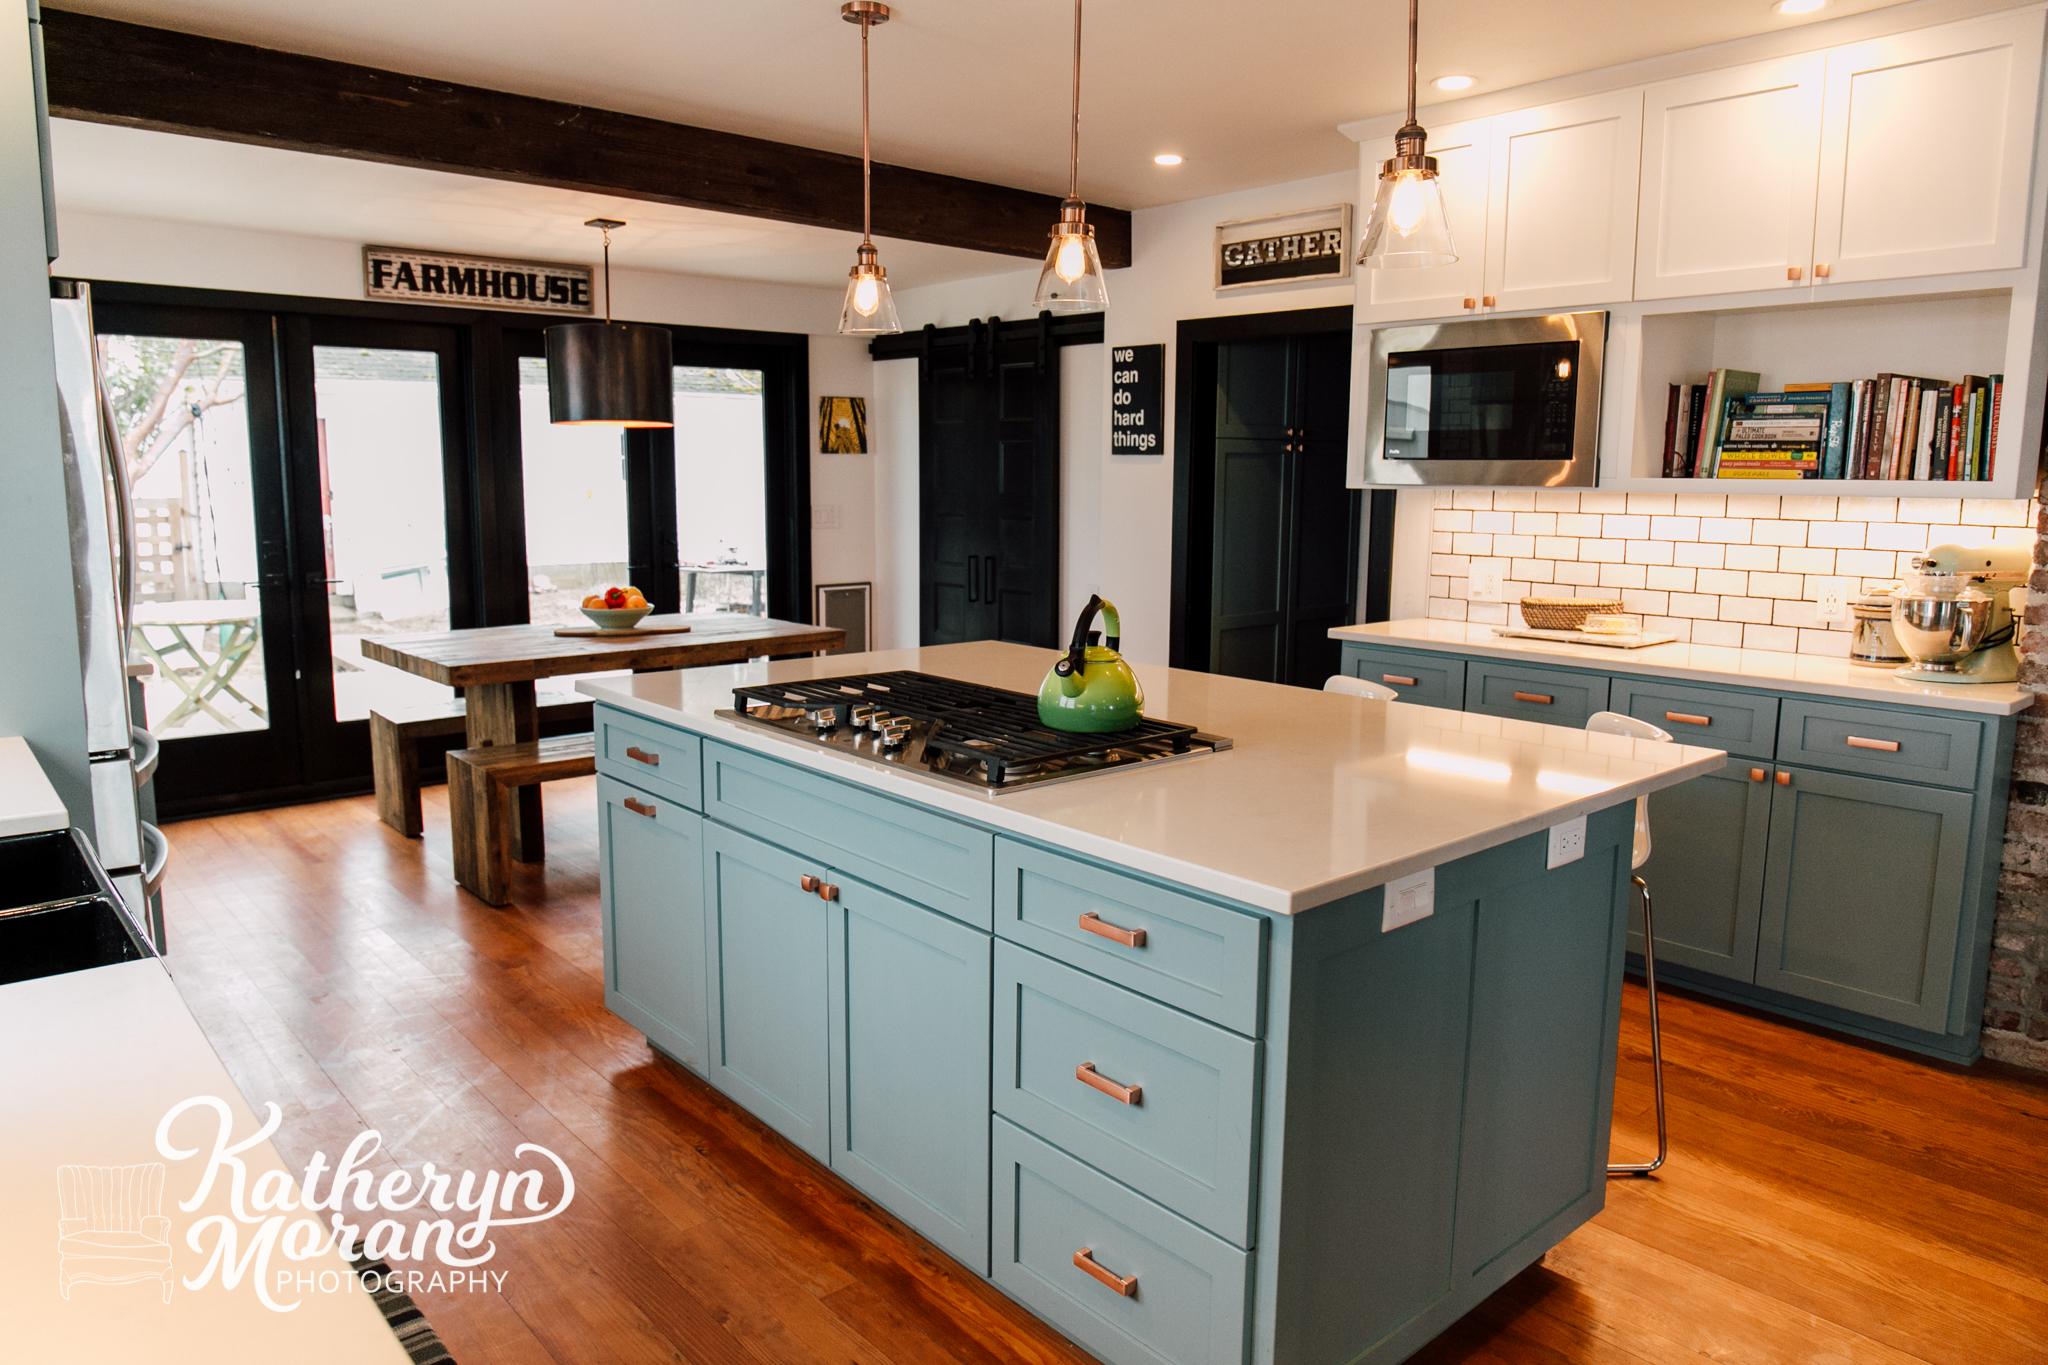 bellingham-photographer-katheryn-moran-jennifer-ryan-designs-interior-design-ferndale-kitchen-2019-1-7.jpg